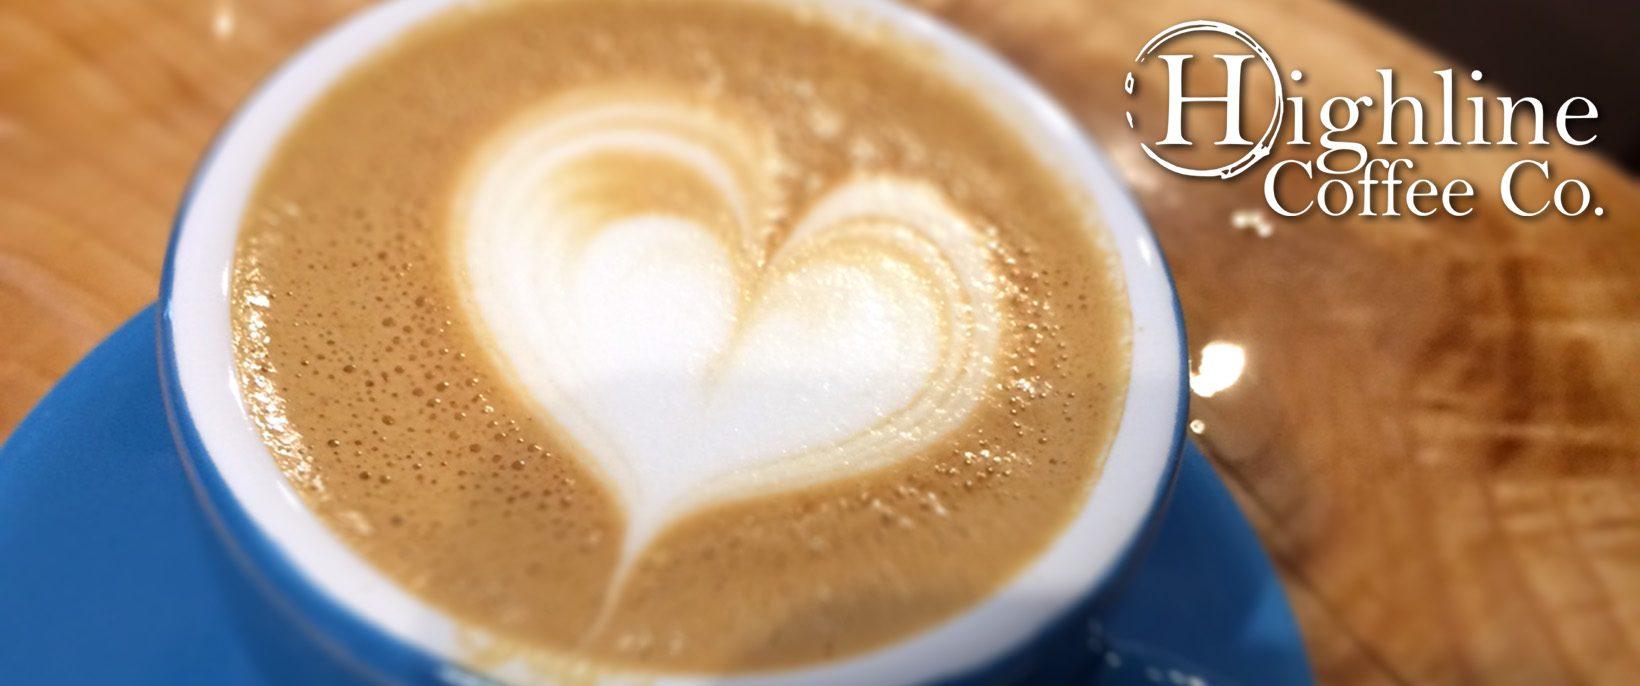 Highline Coffee Company